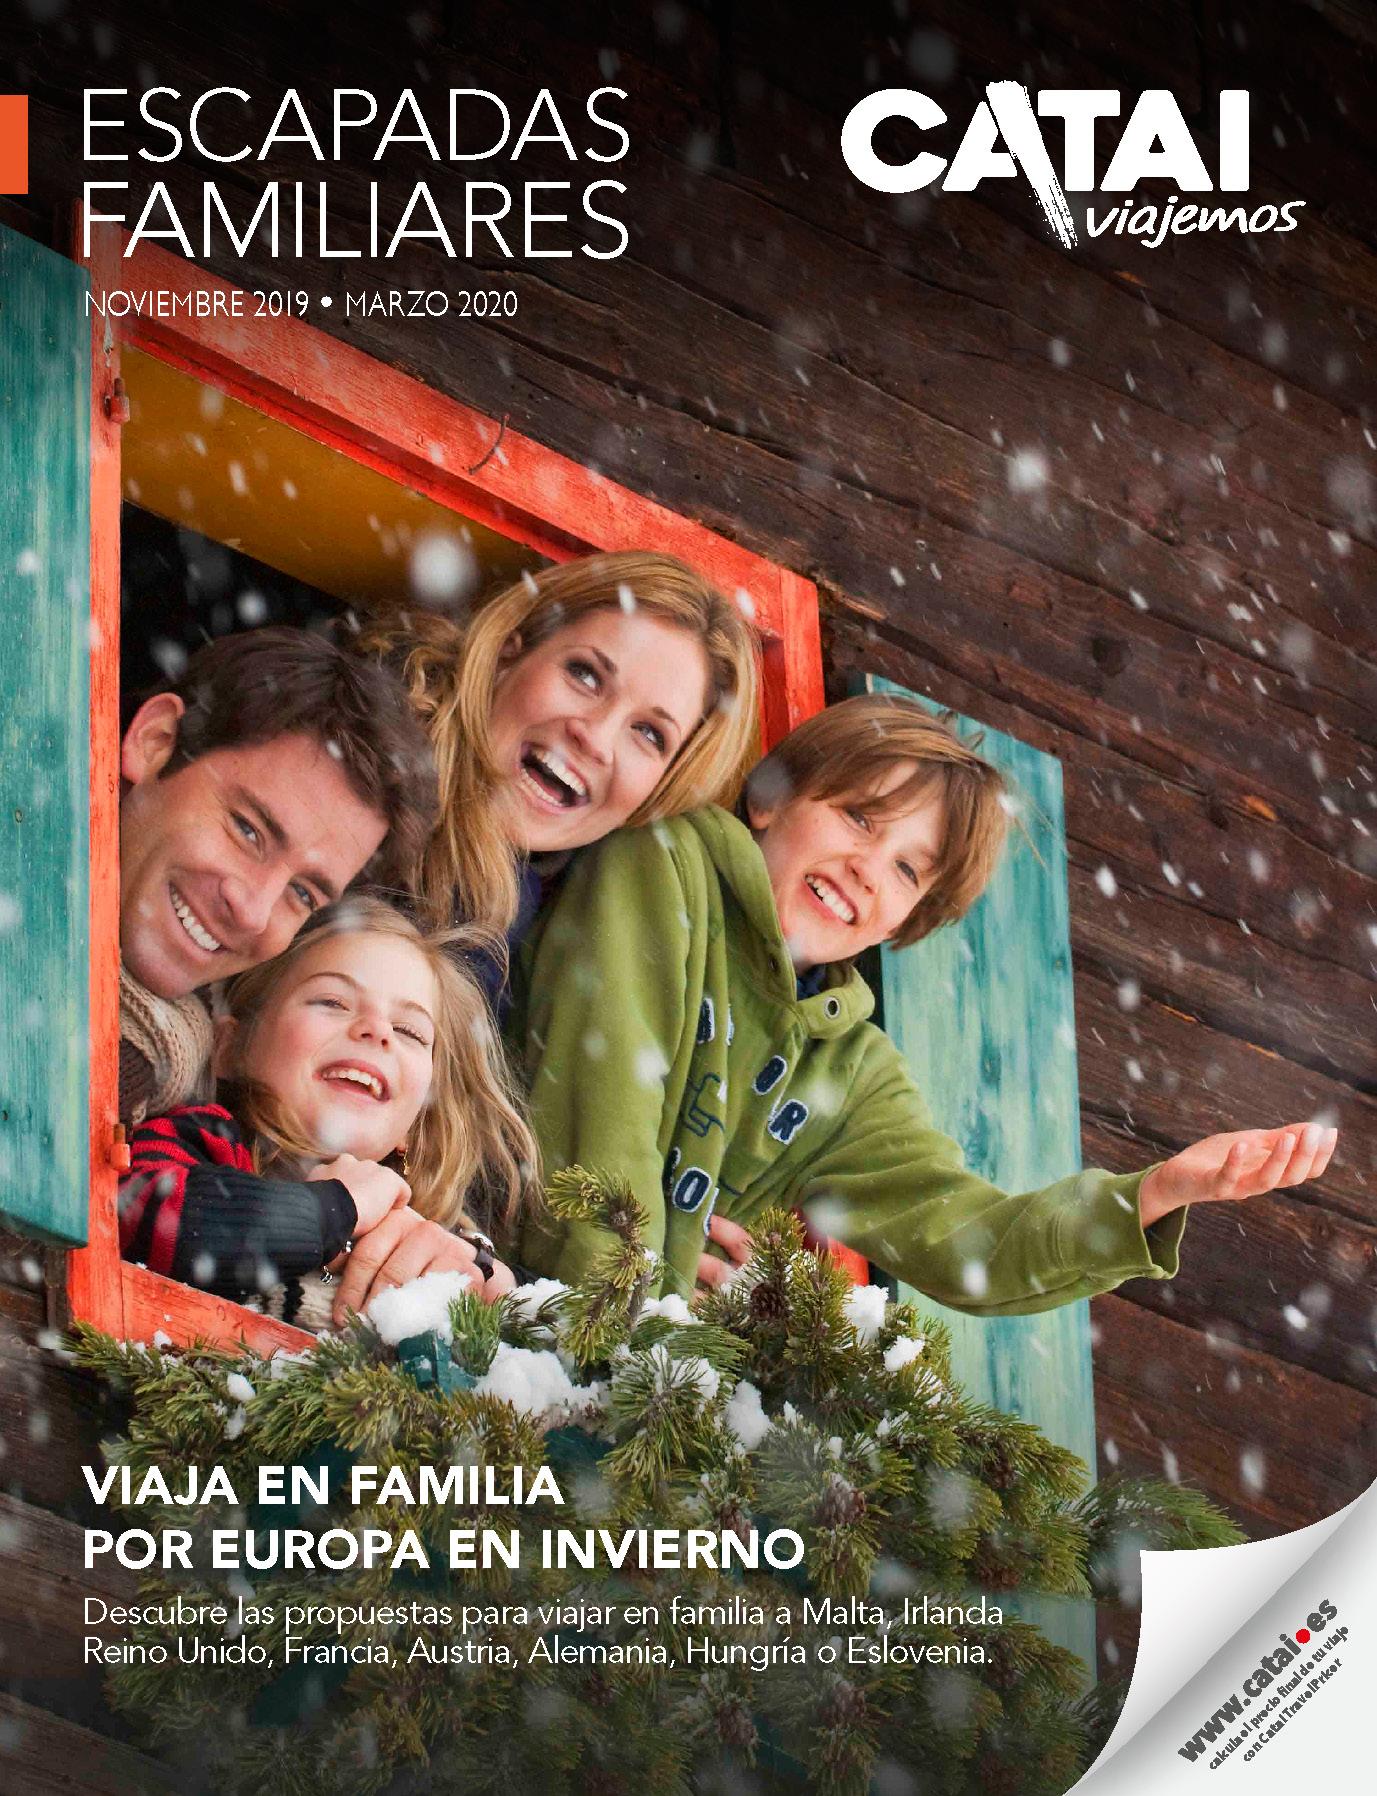 Catalogo Catai Familias Invierno 2019-2020